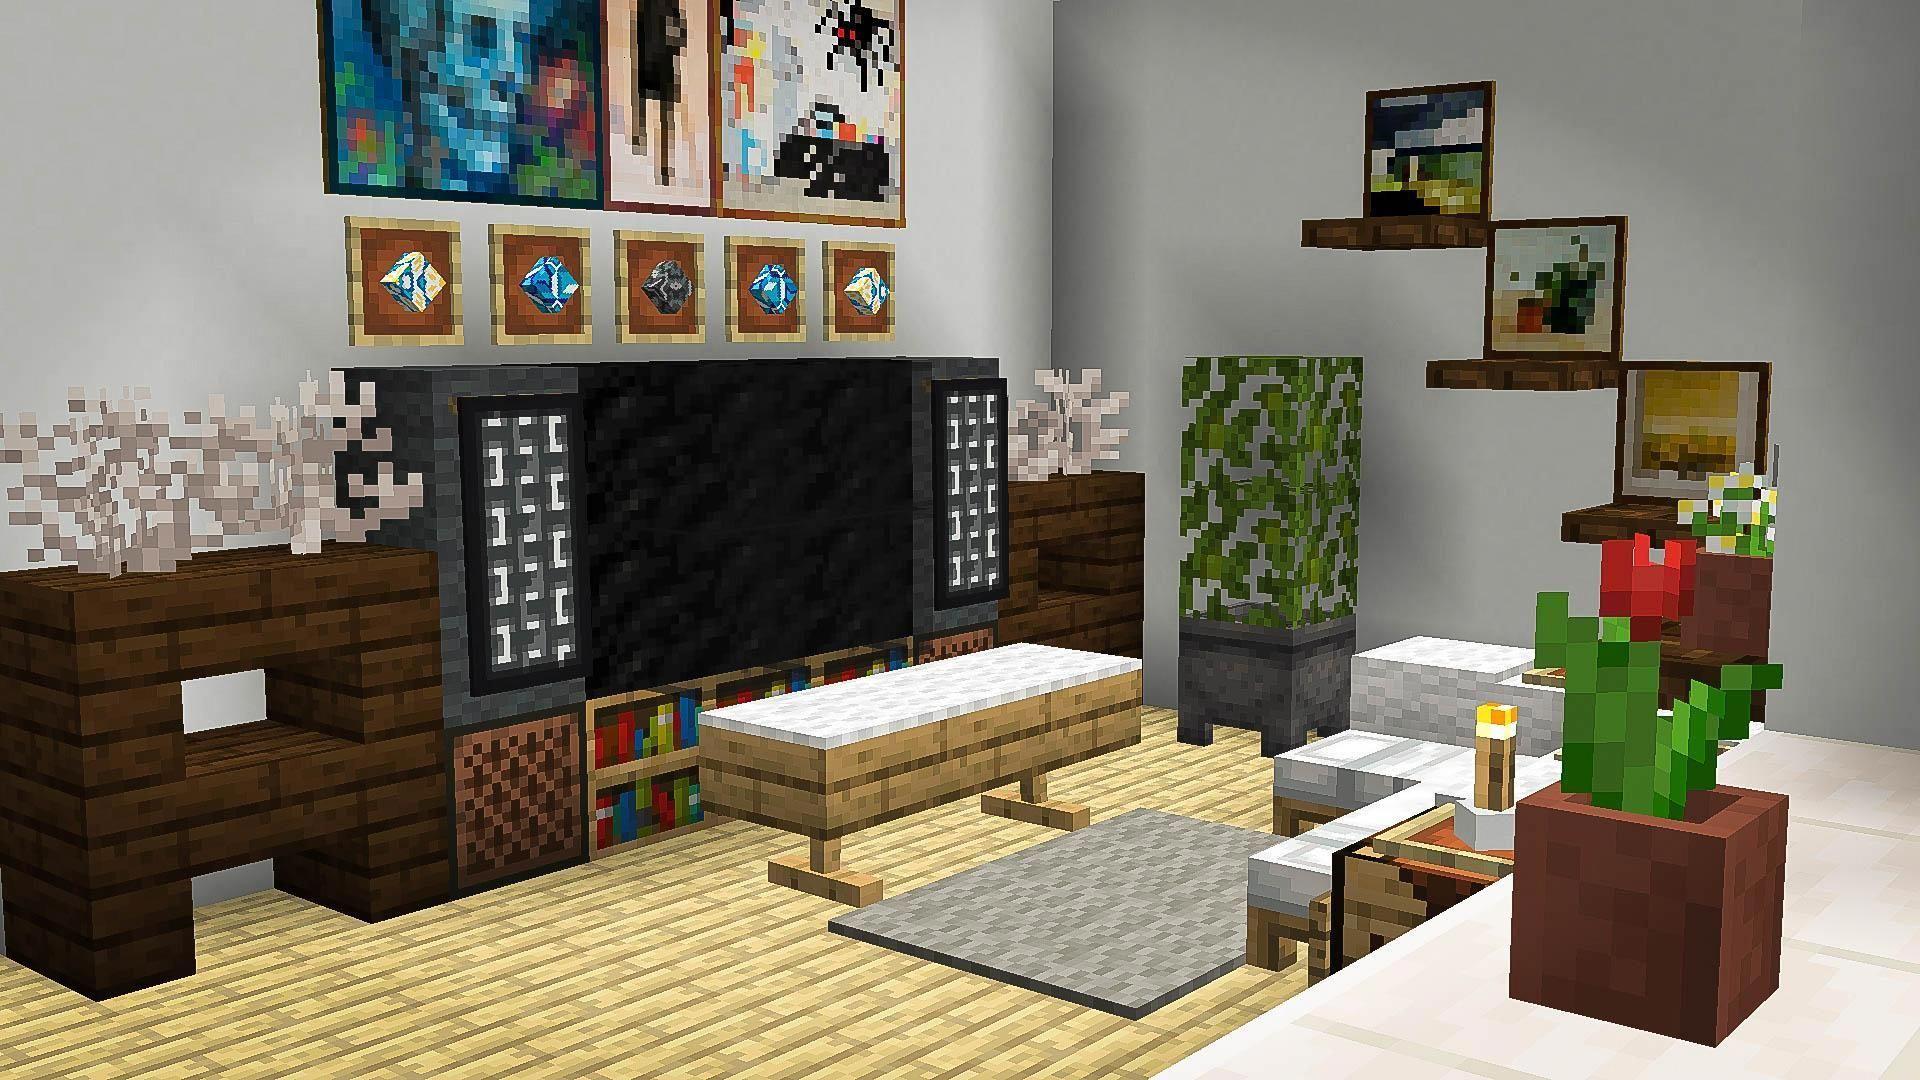 A Bright Living Room Minecraft Homedecorlivingroom In 2020